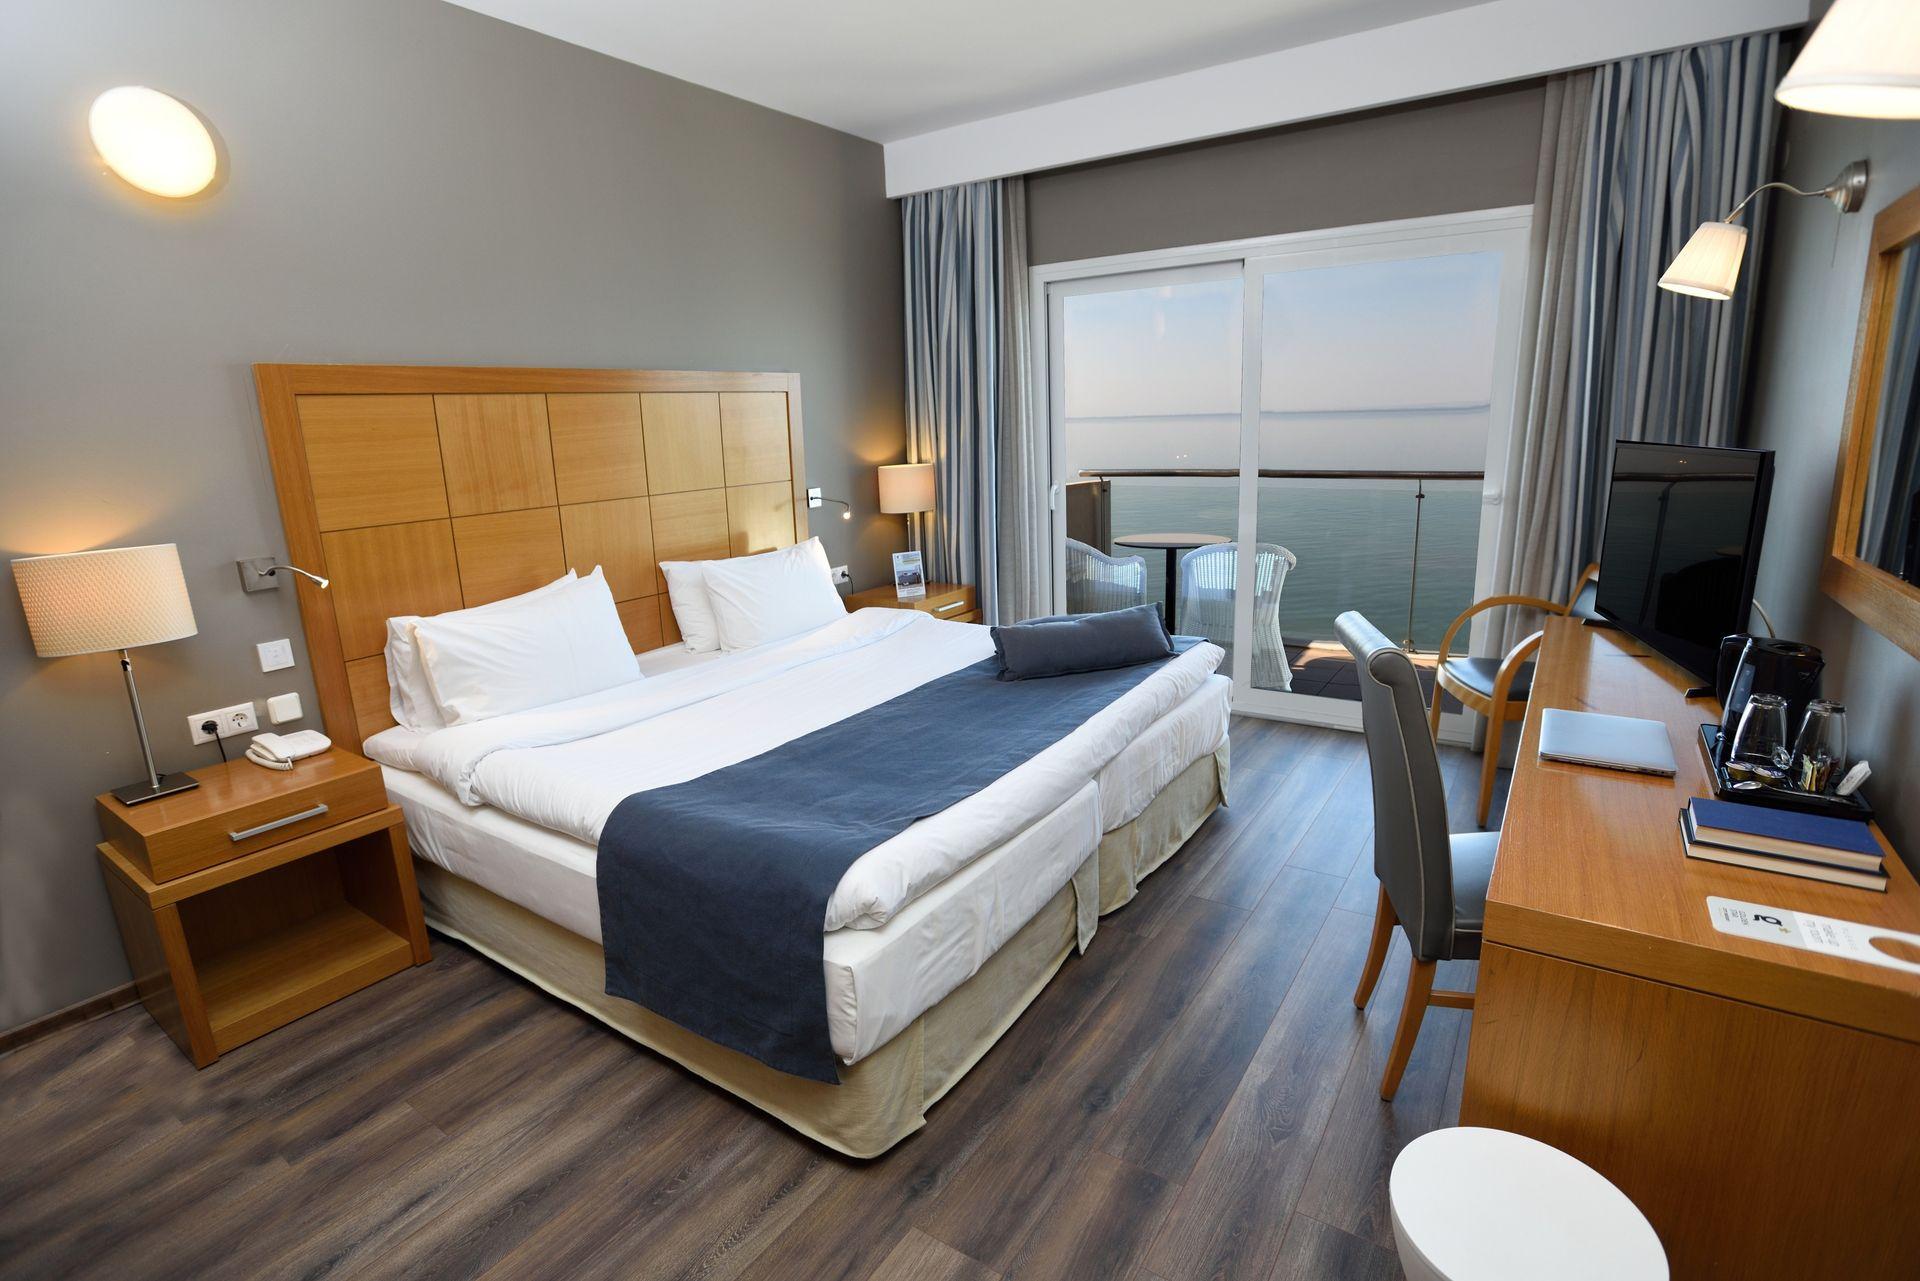 4* Golden Star City Resort - Θεσσαλονικη ✦ -30% ✦ 4 Ημερες (3 Διανυκτερευσεις) ✦ 2 ατομα ✦ Ημιδιατροφη ✦ εως 30/09/2020 ✦ Free WiFi